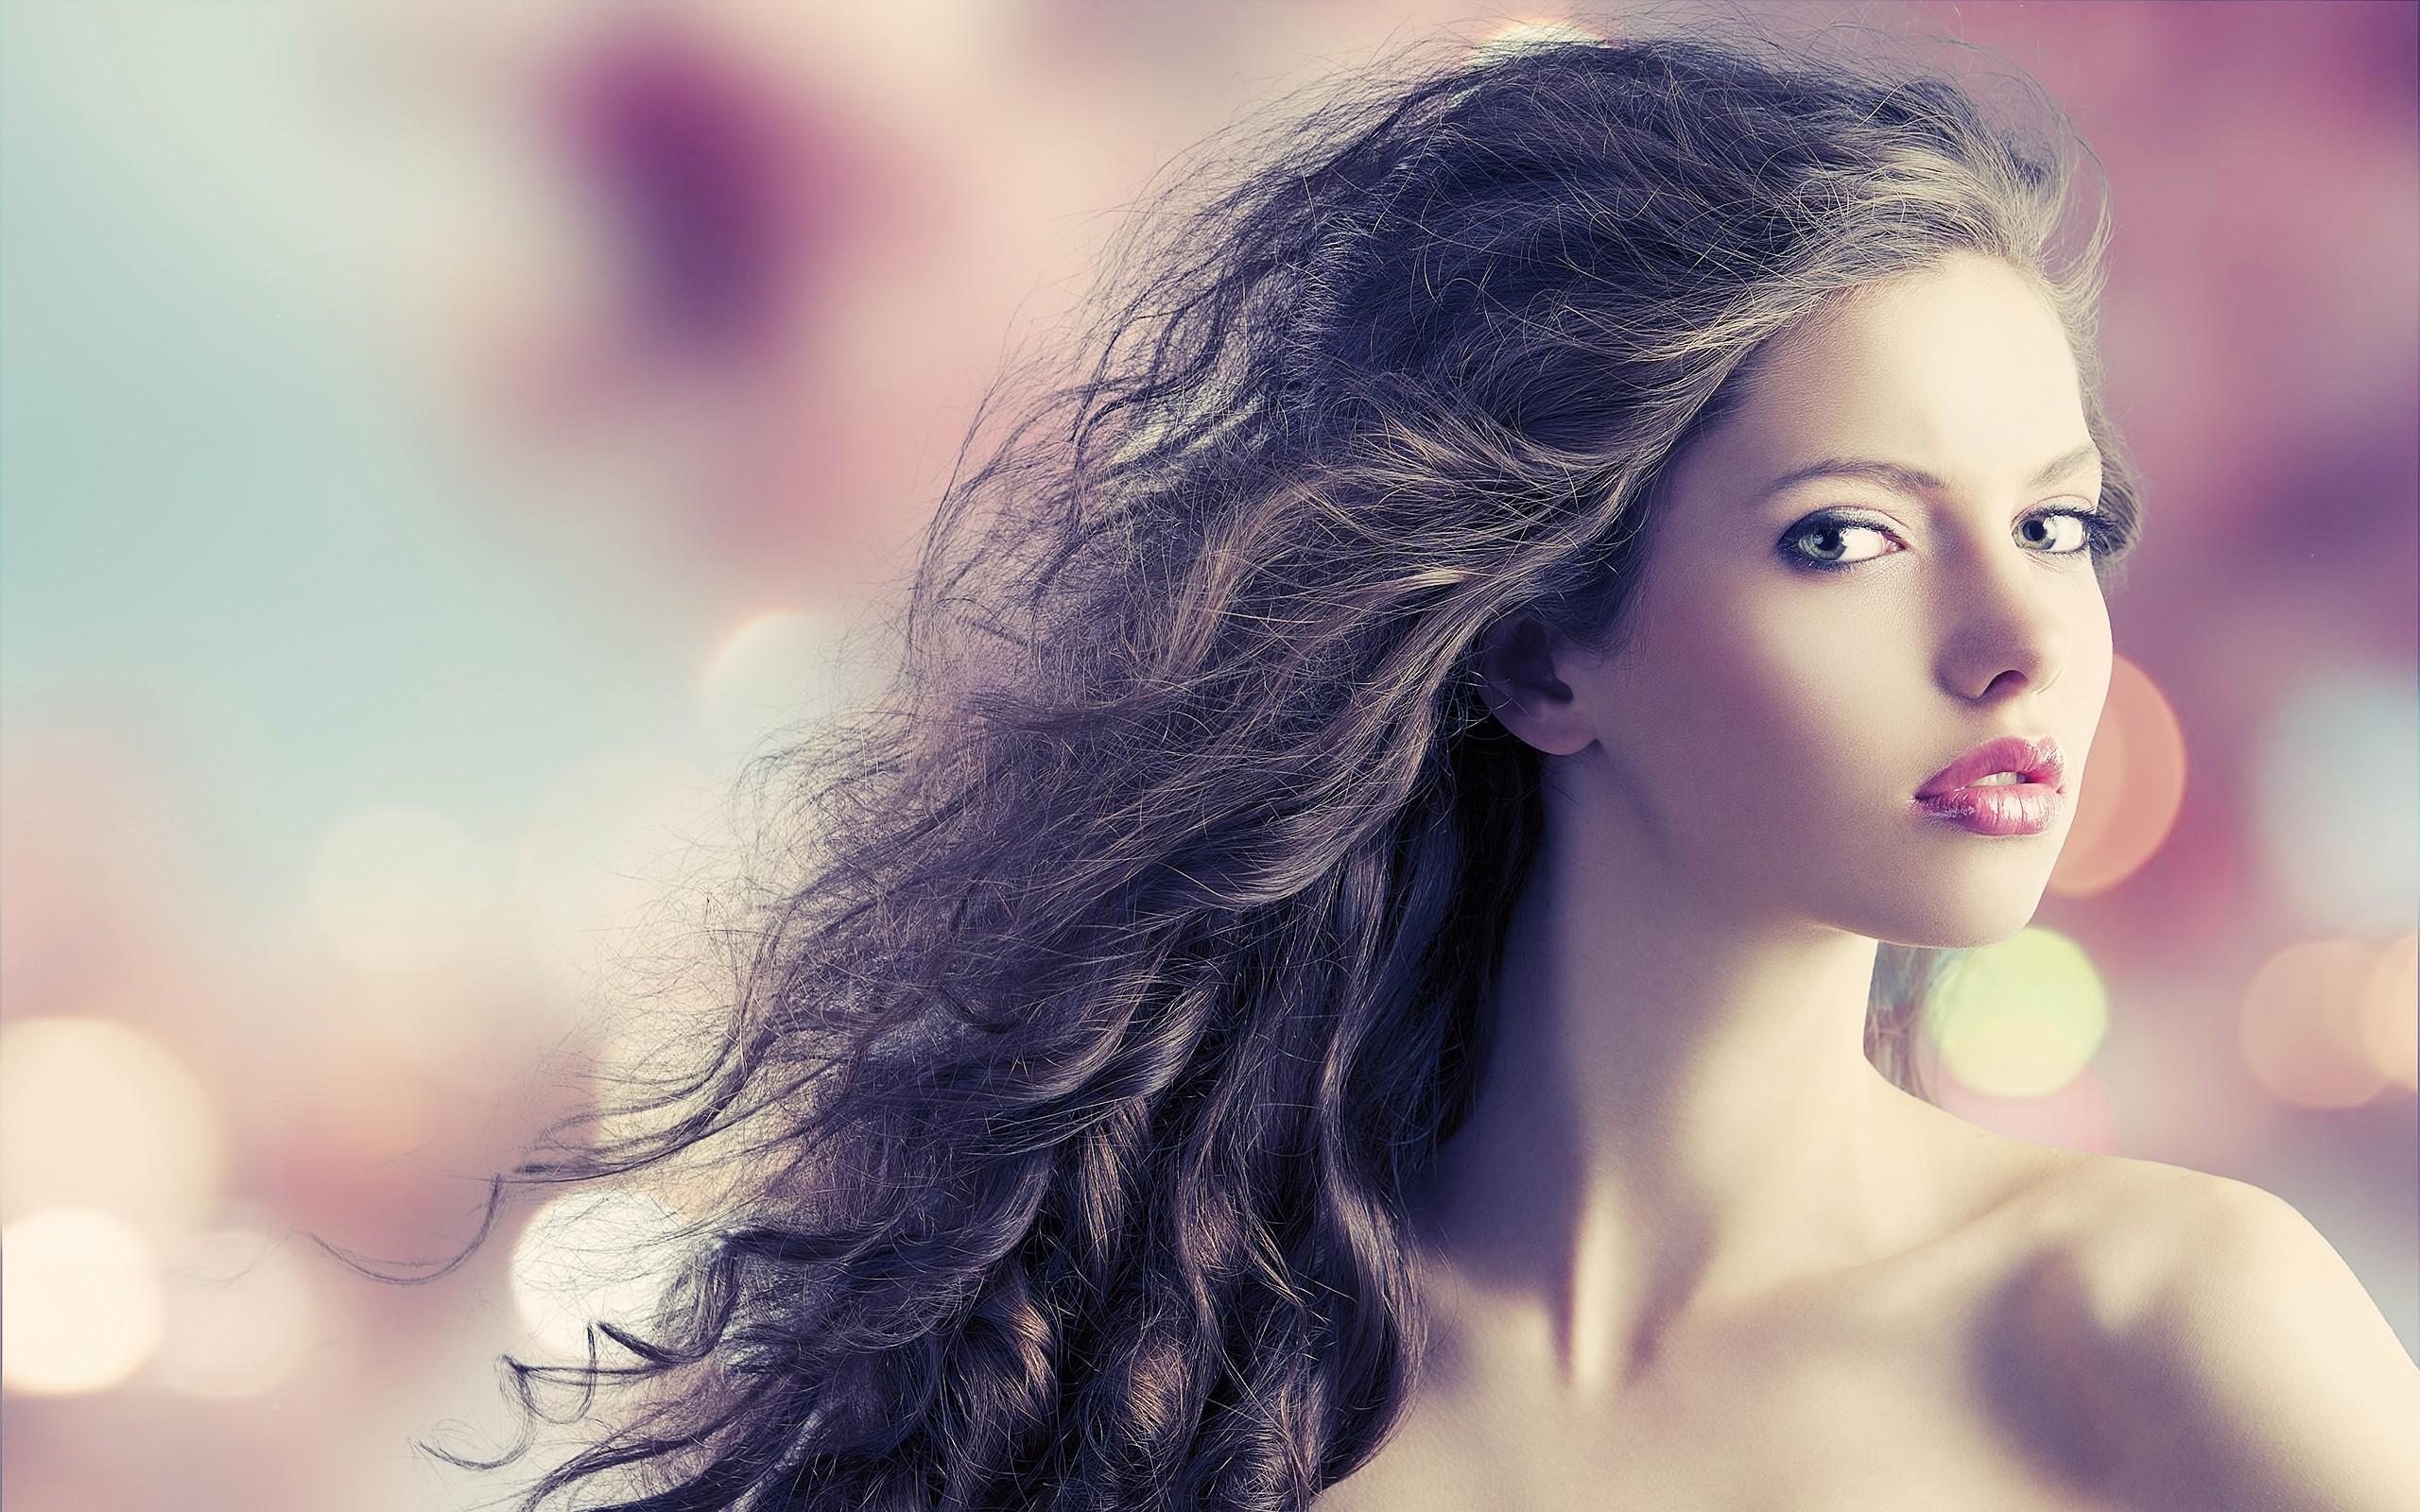 Wallpaper  Face, Model, Long Hair, Black Hair, Fashion, Person, Skin, Head, Color, Flower, Girl -8166